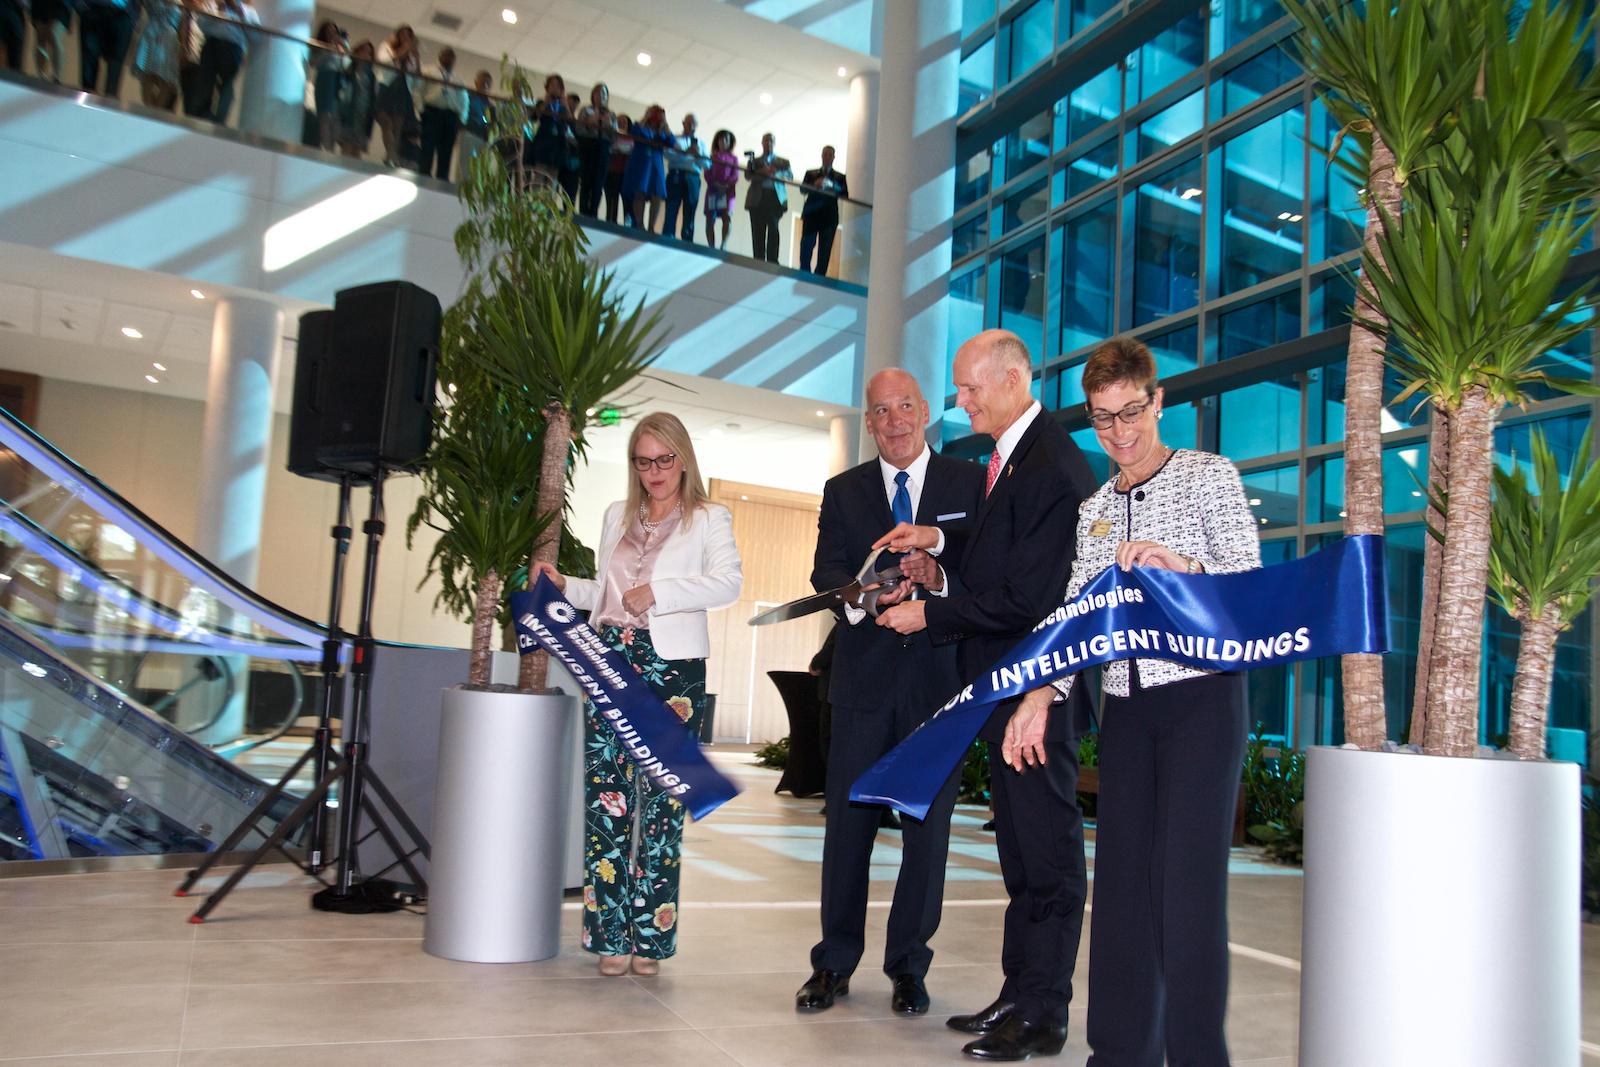 Superb Rick Scott Cuts The Ribbon At UTCu0027s Center For Intelligent Buildings In Palm  Beach Gardens On Apr. 17, 2018. Nice Design